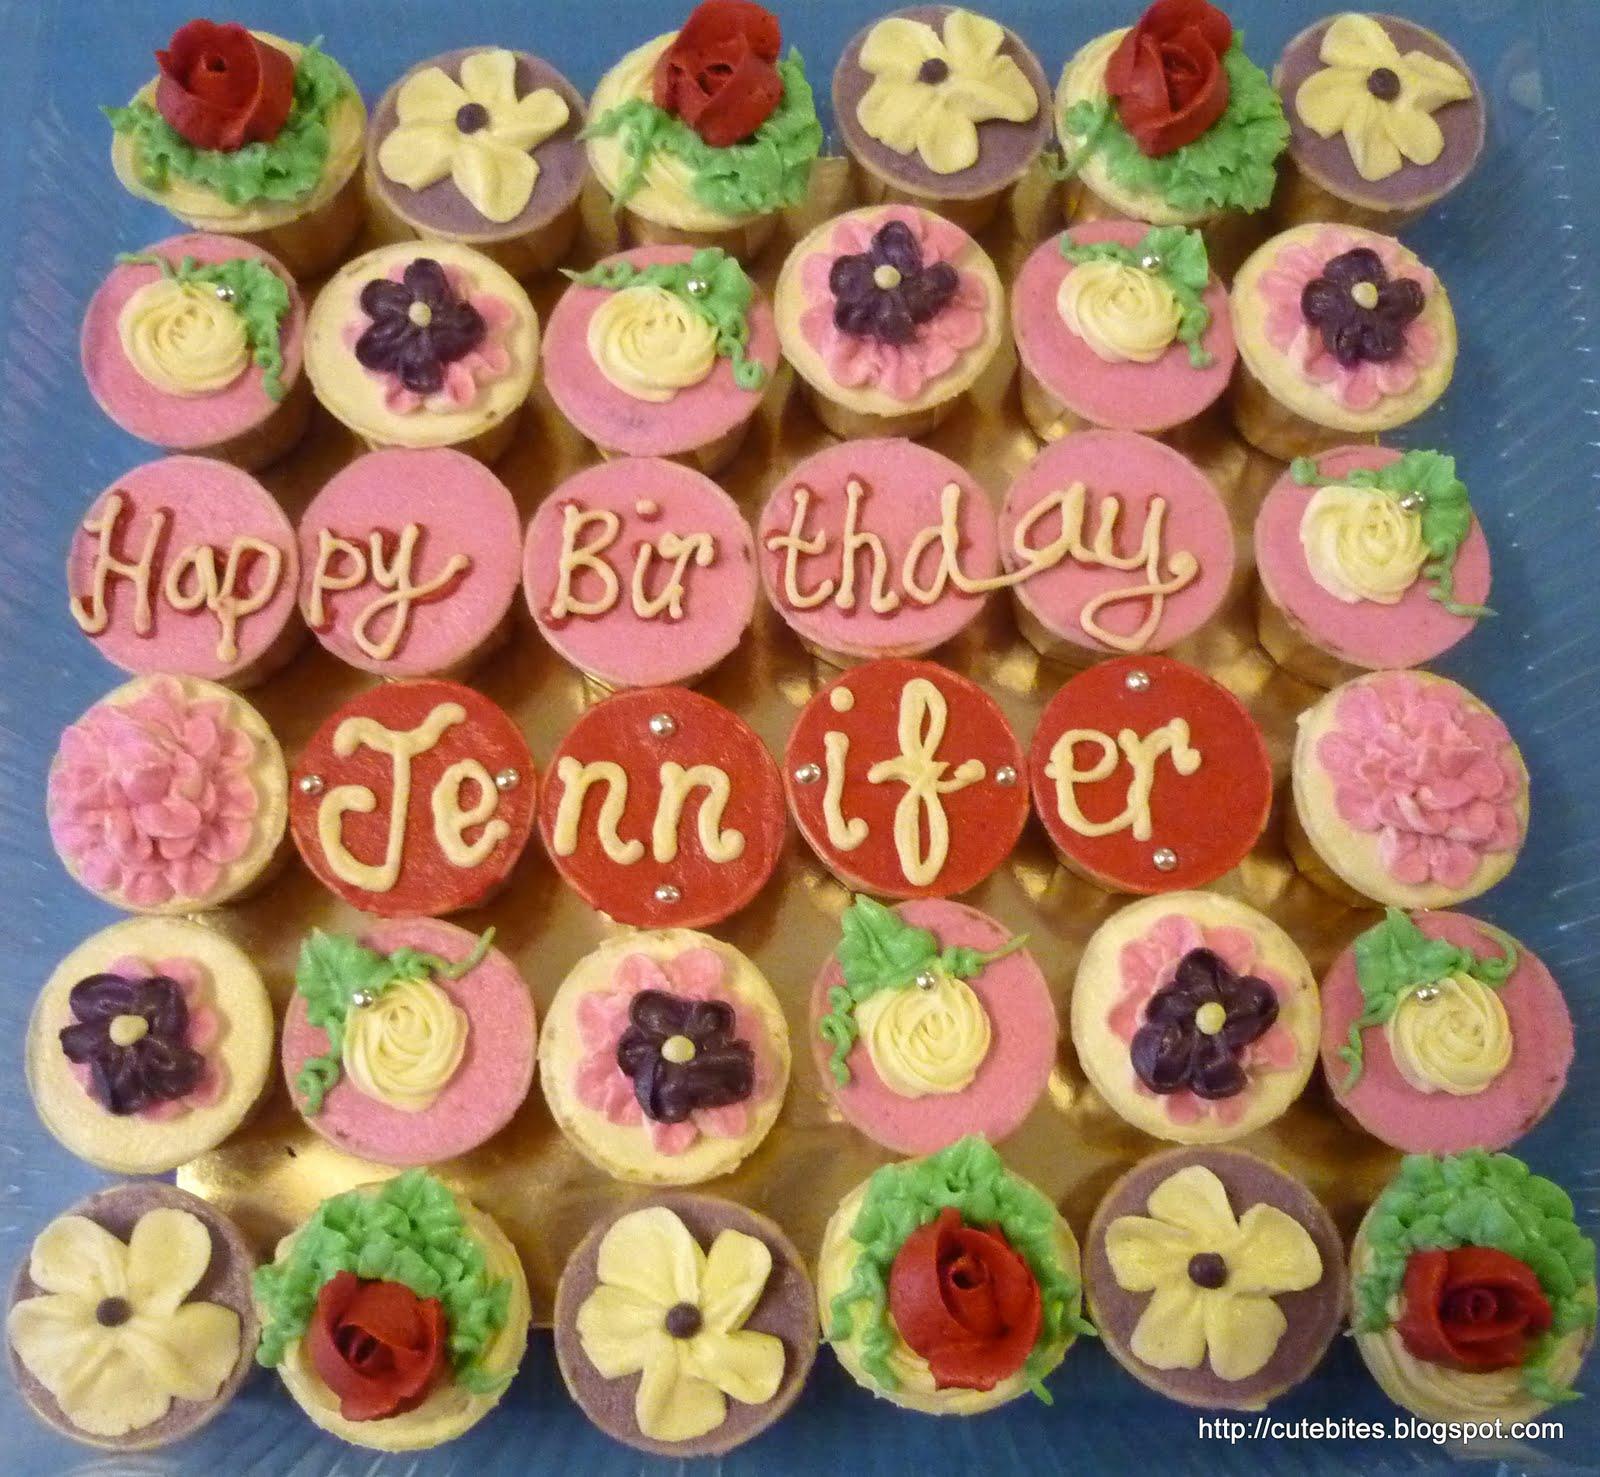 Too Cute To Resist....: :: Happy Birthday Jennifer